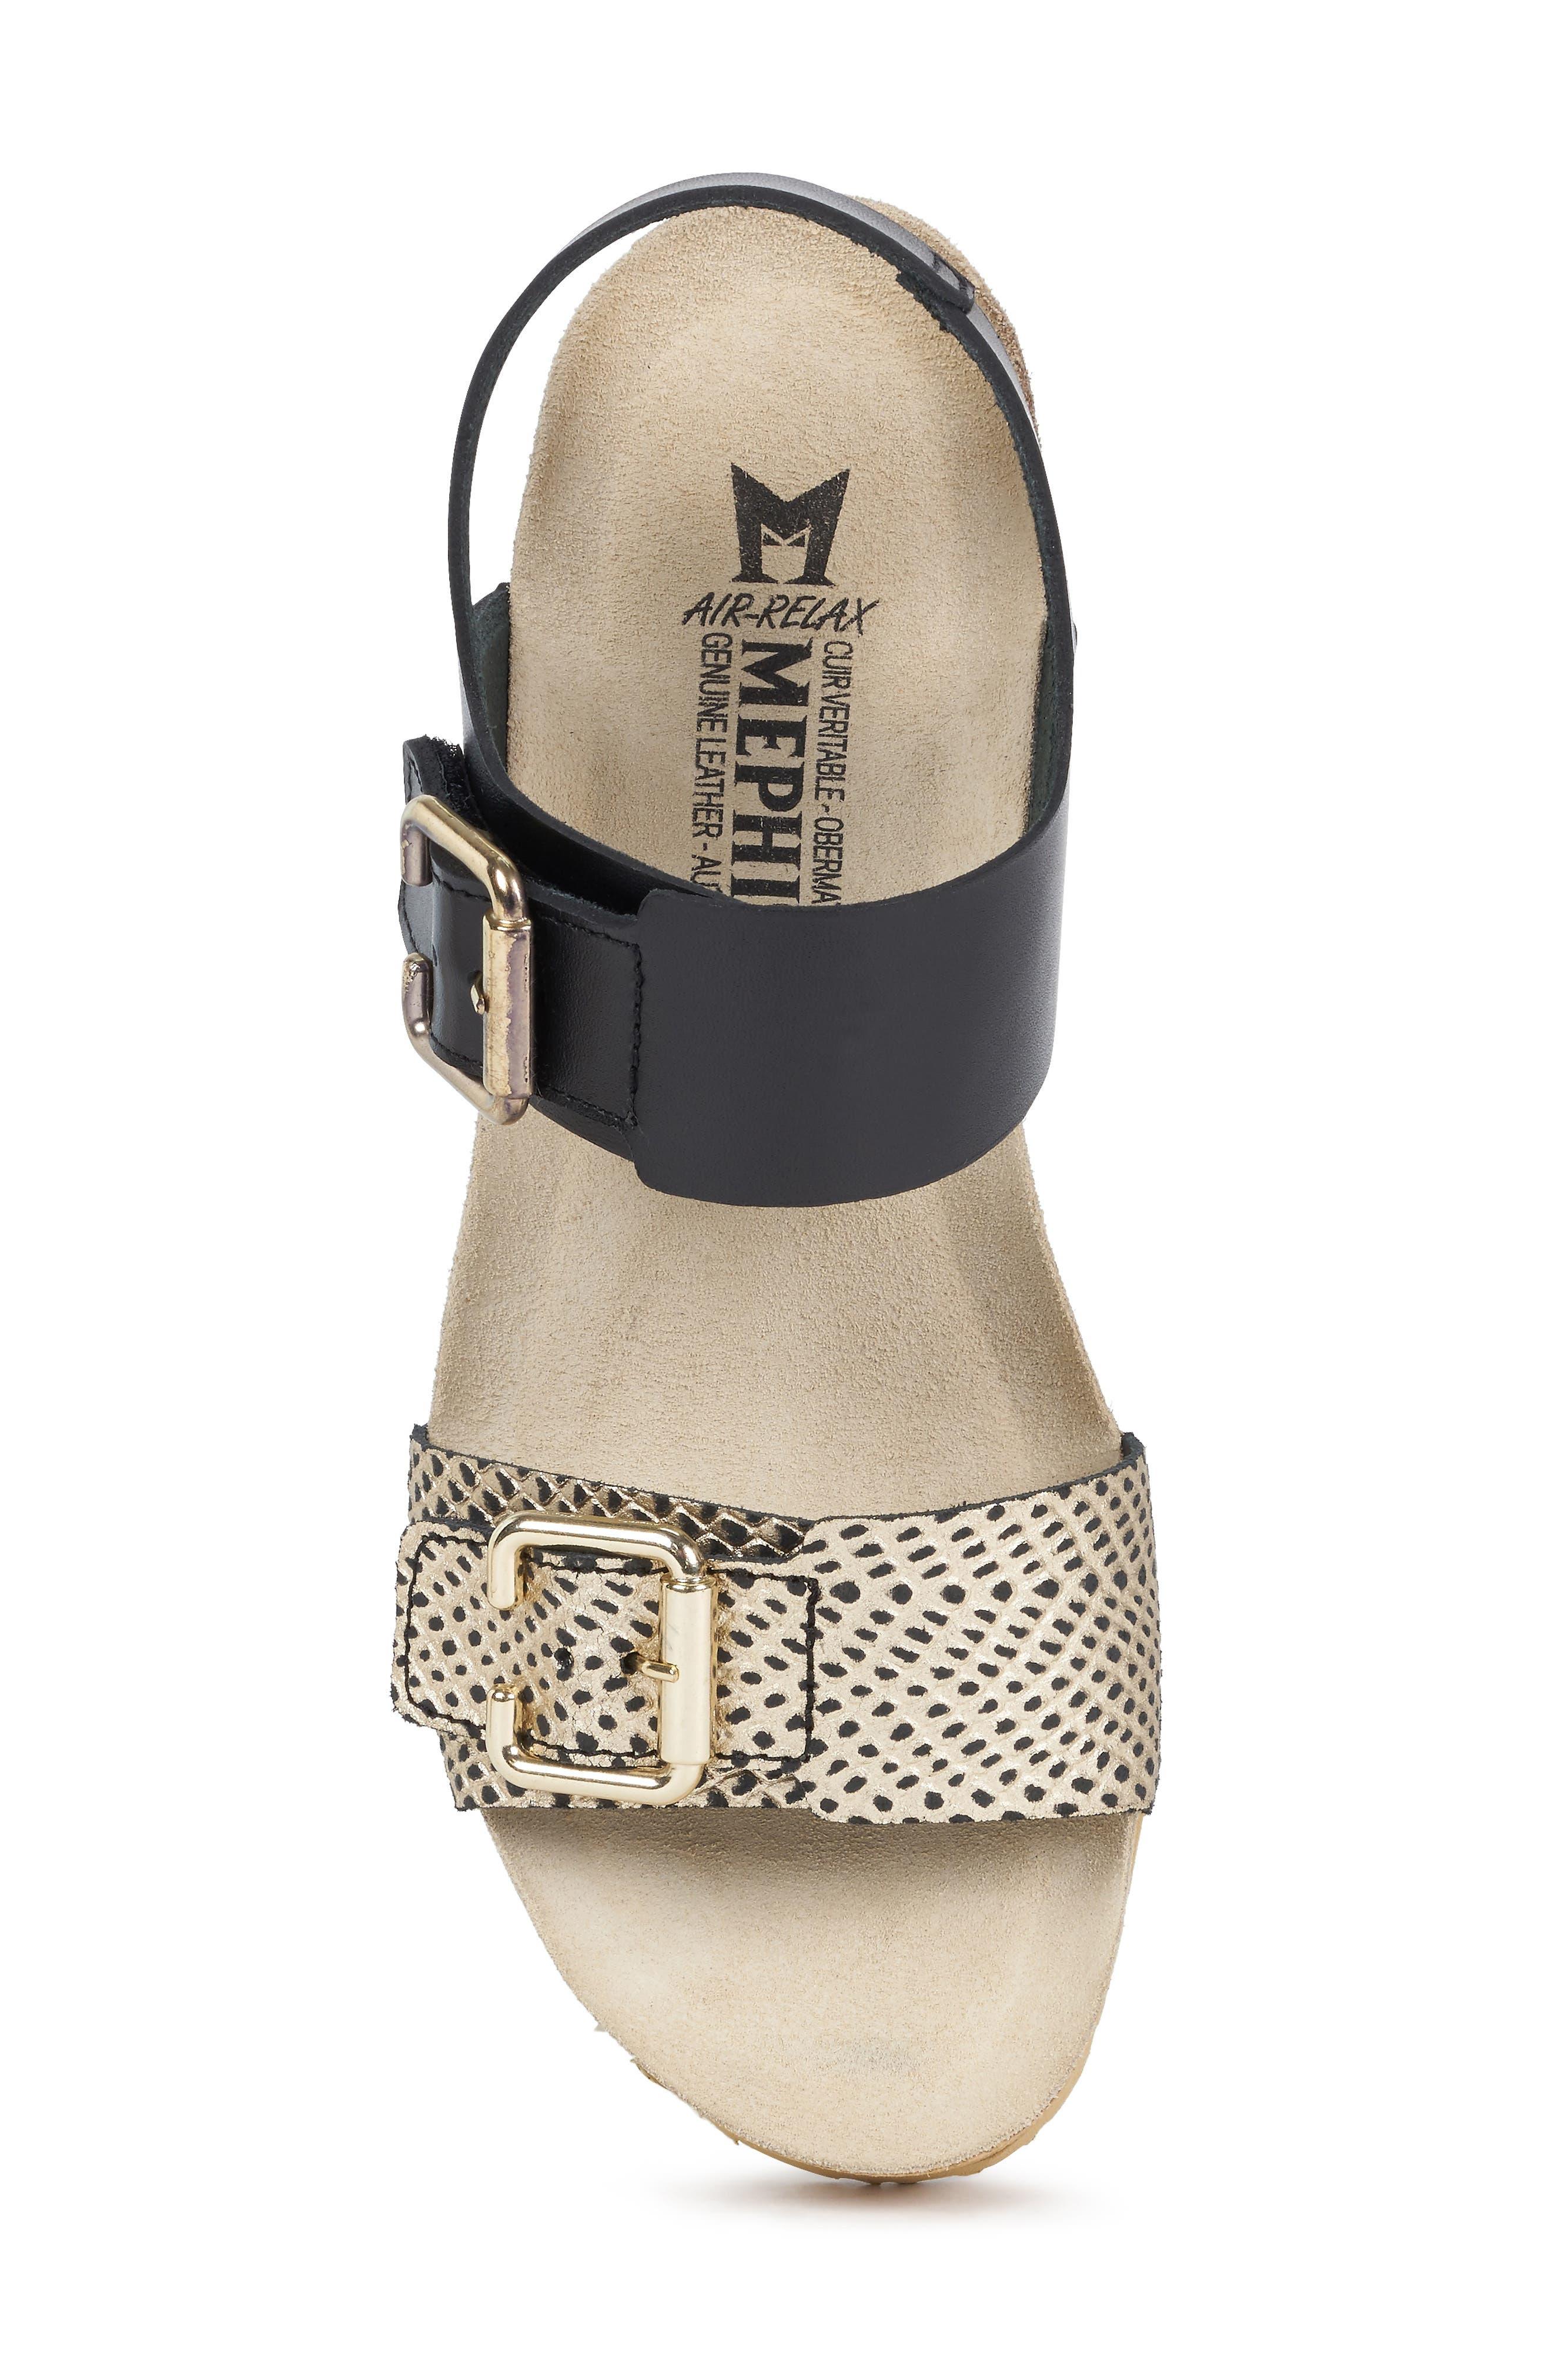 Lissandra Platform Wedge Sandal,                             Alternate thumbnail 5, color,                             BLACK/ GOLD LEATHER